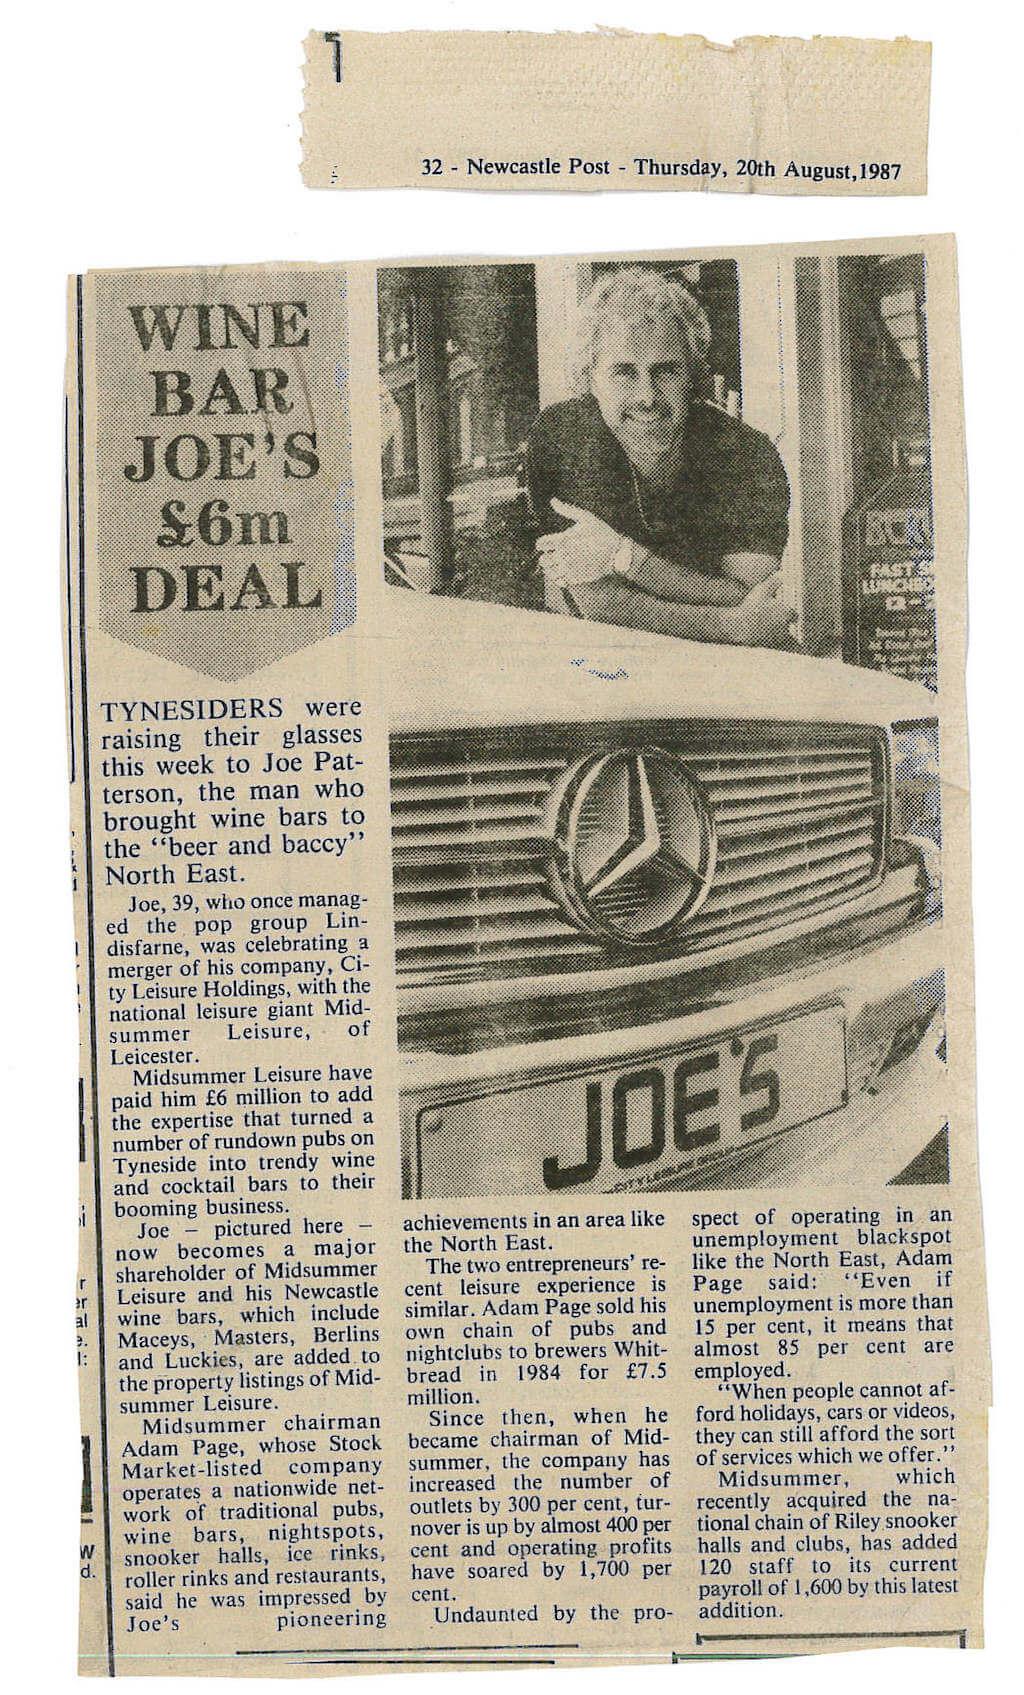 joe robertson news article - Headlined Wine Bar Joe's £6 million deal